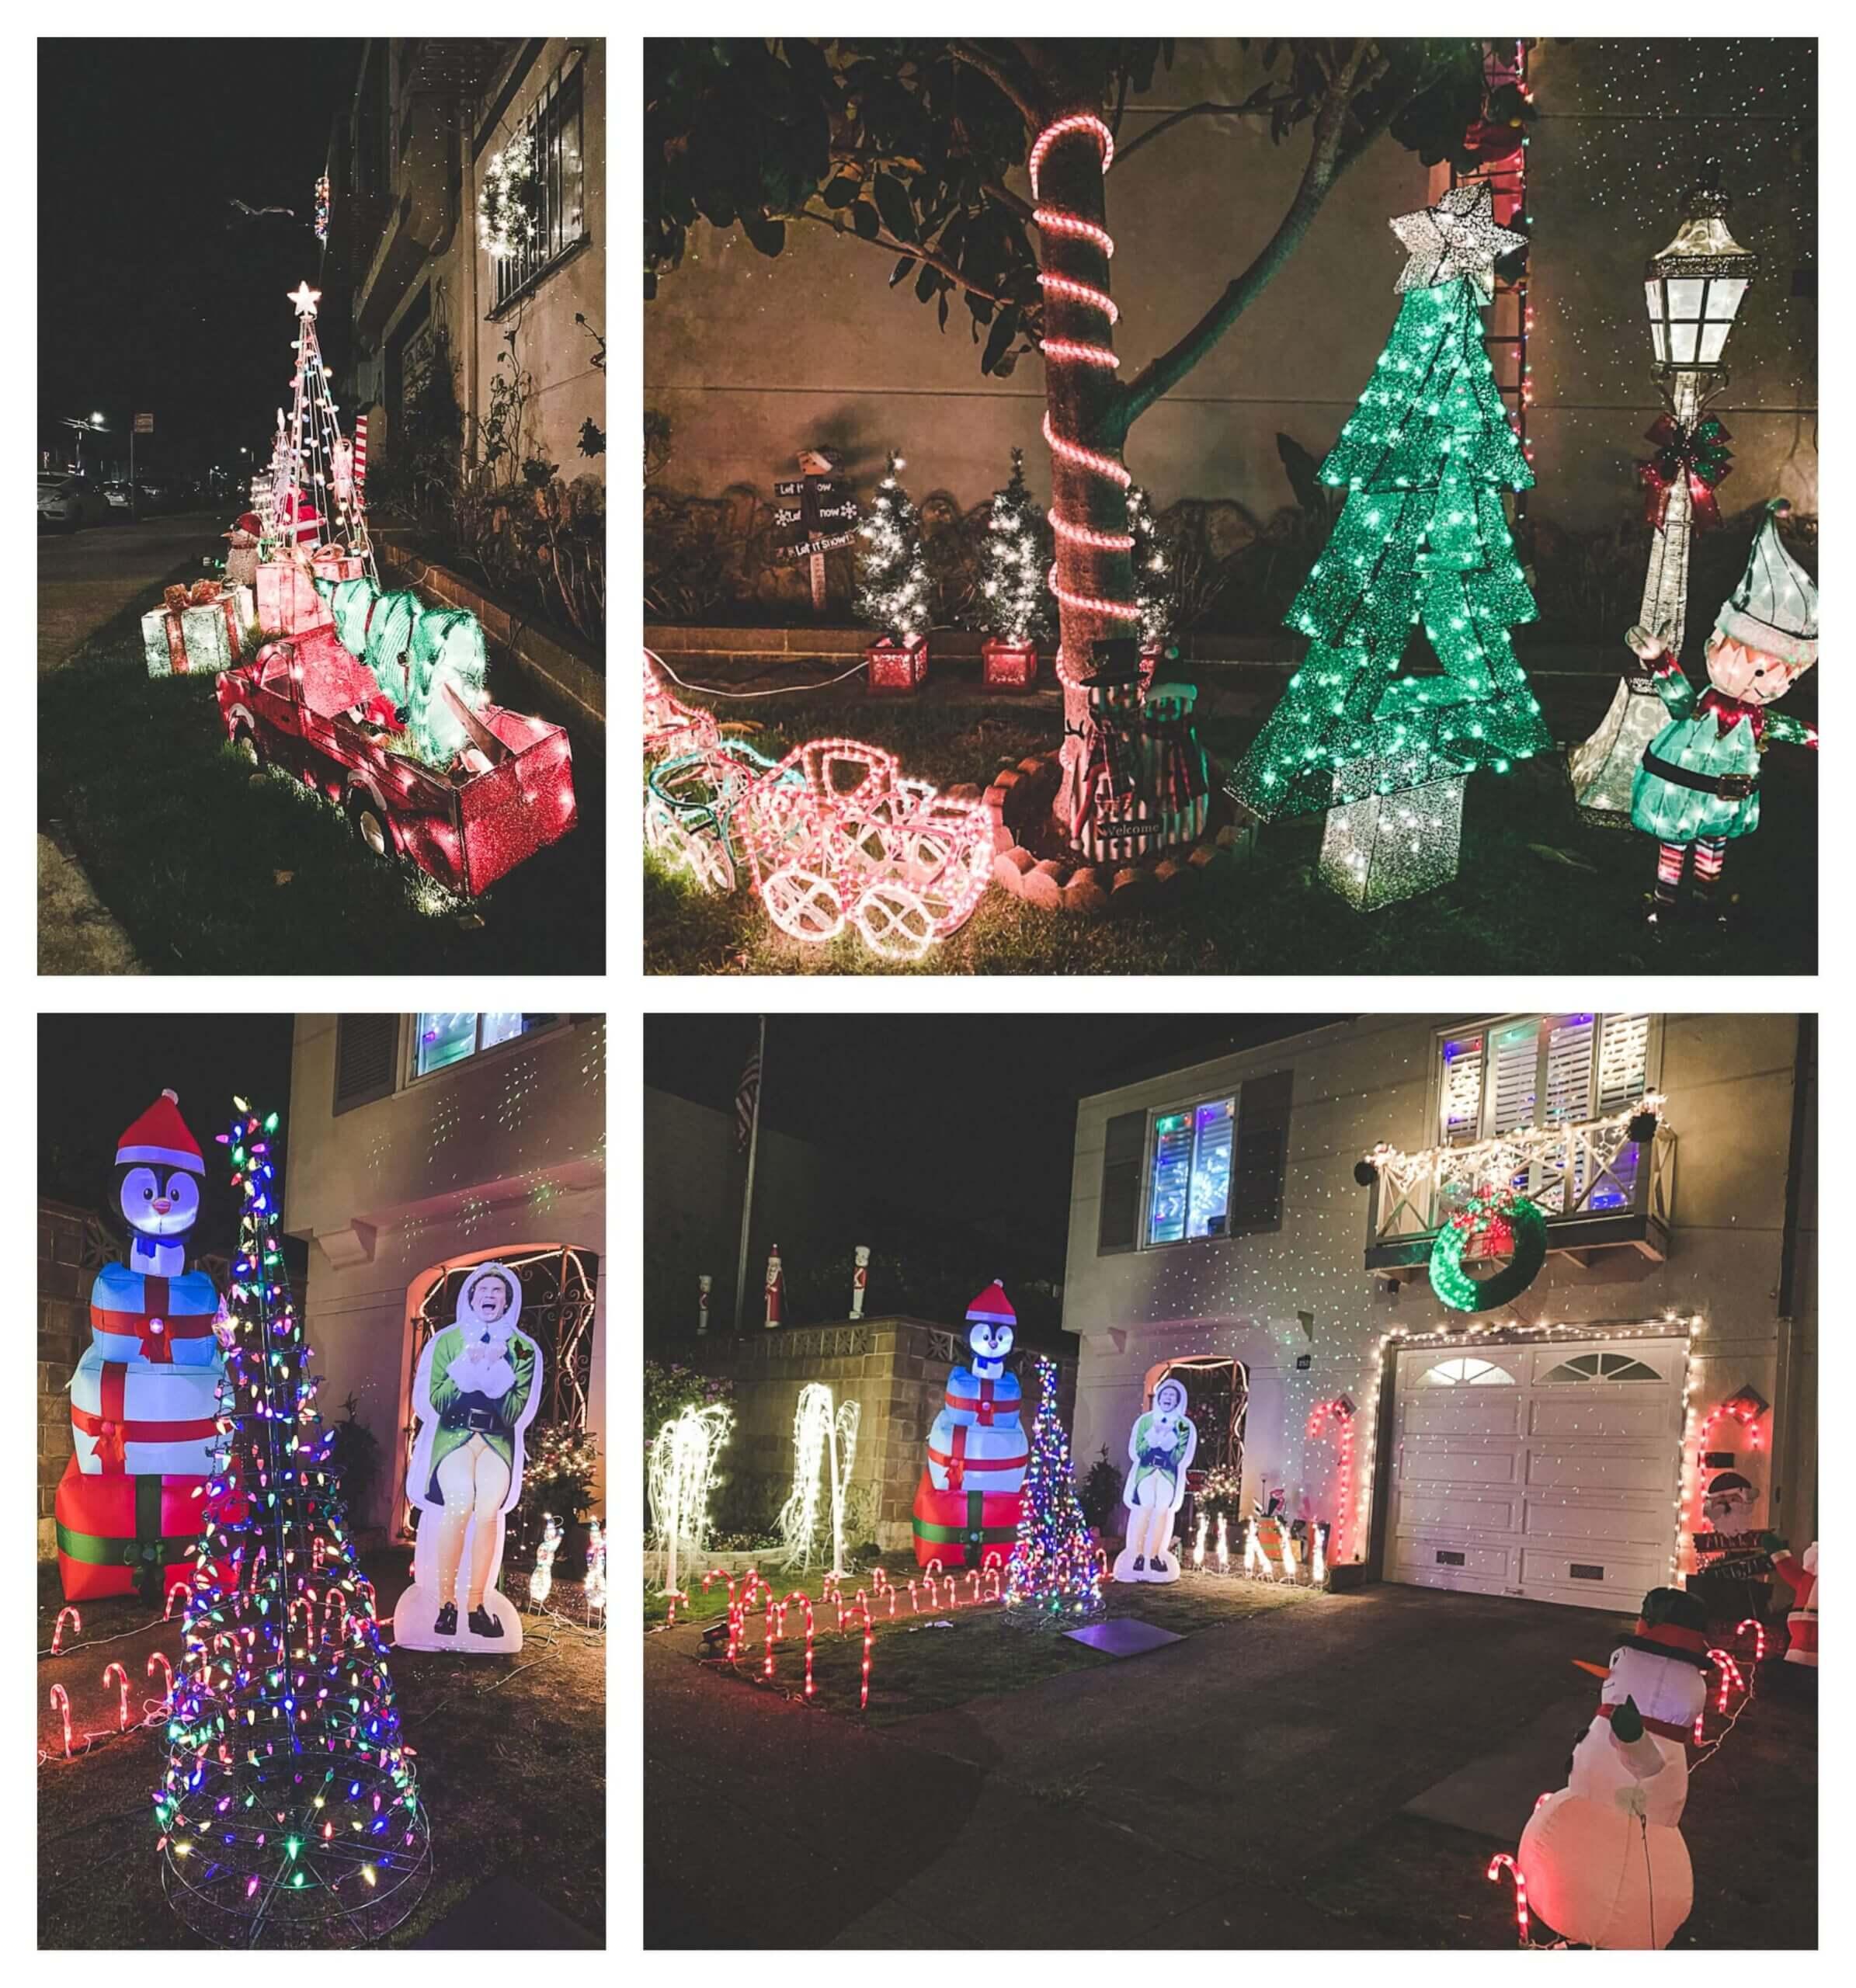 Christmas lights of San Francisco in Sunset neighborhood